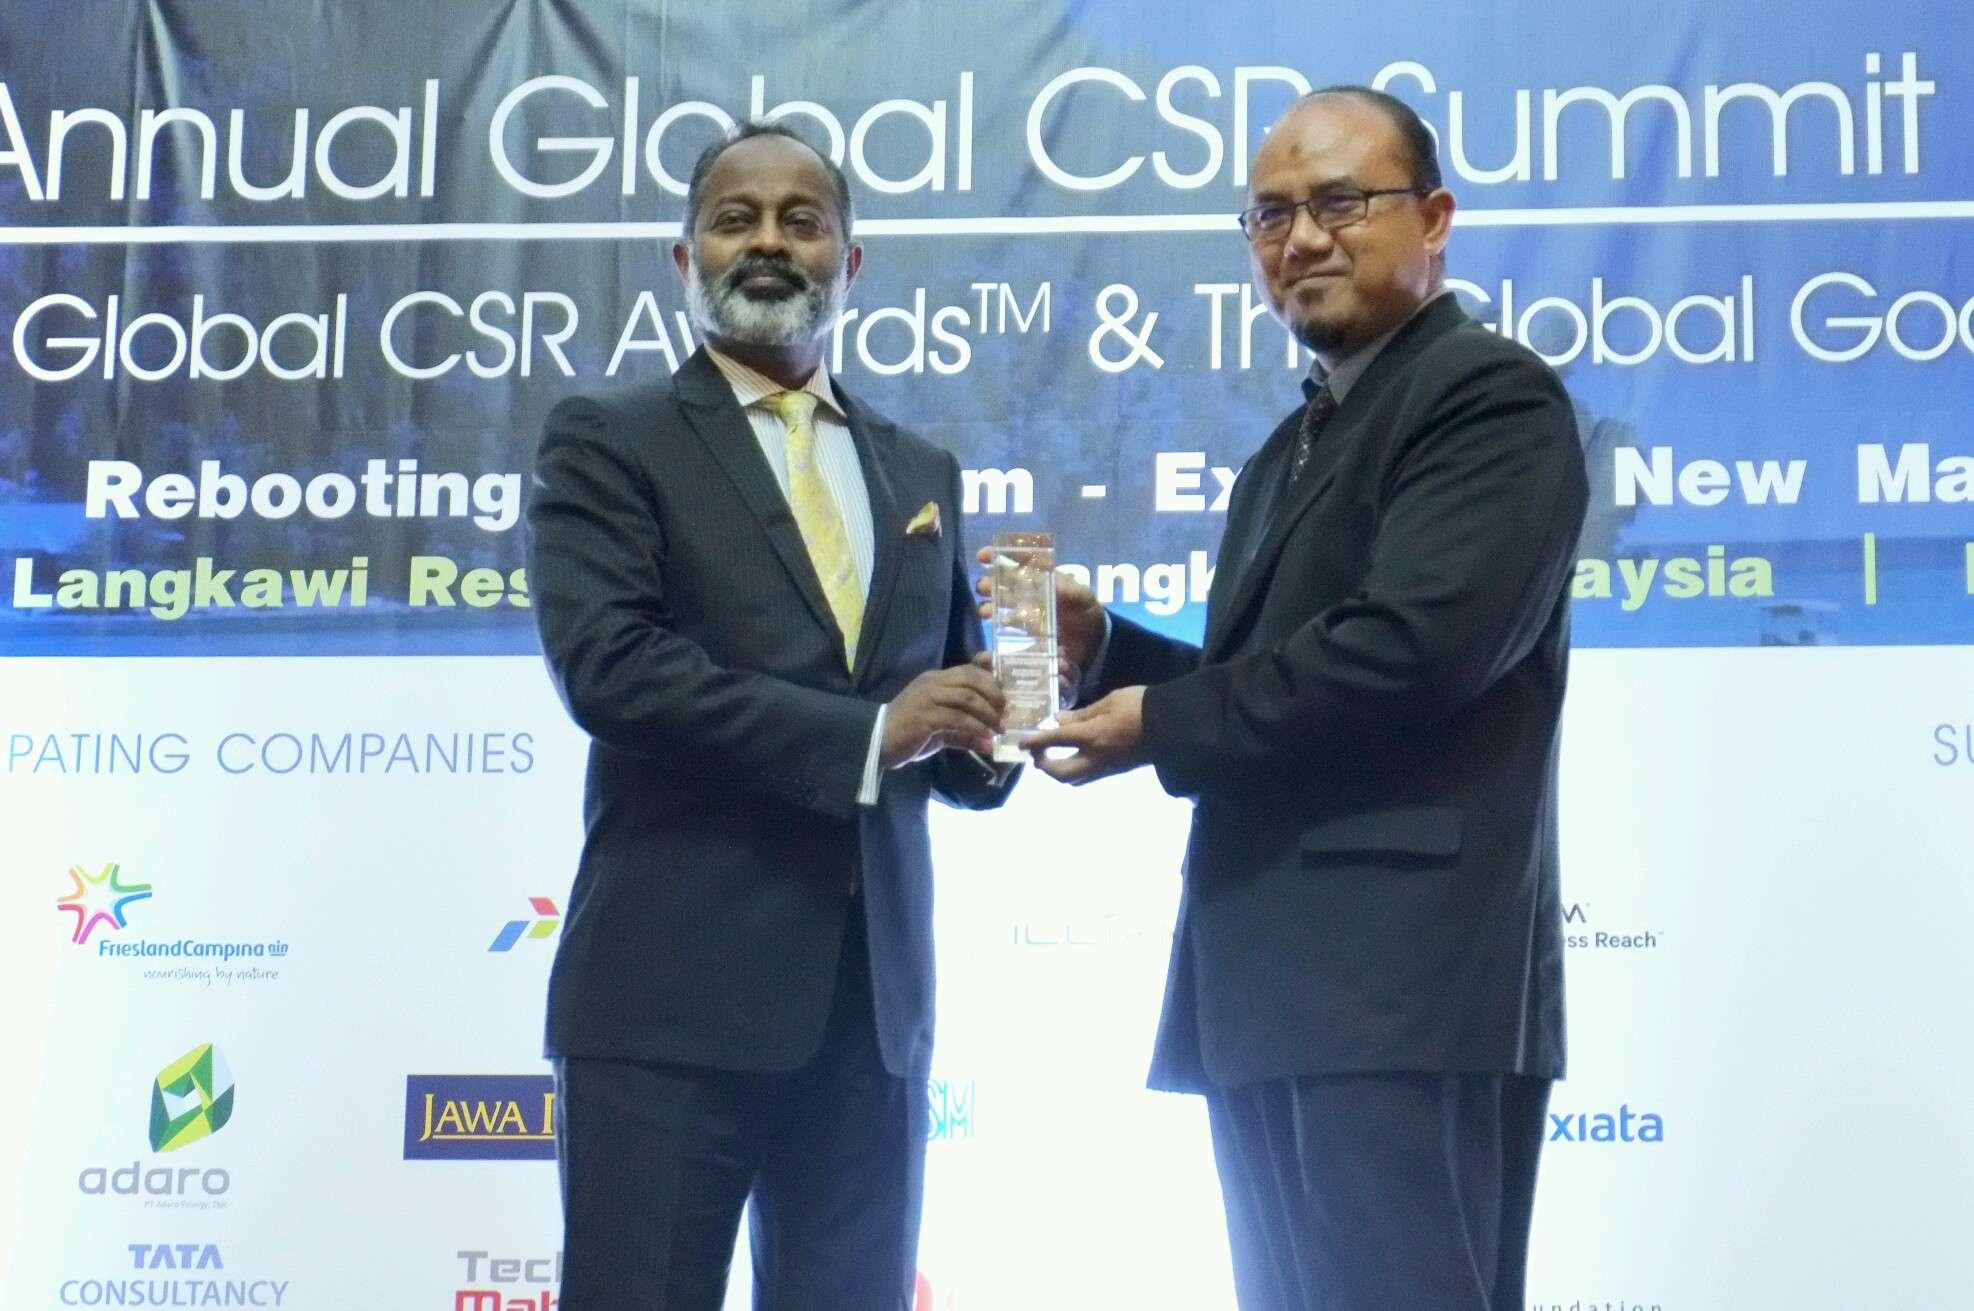 Perusahaan Top Raih The 9th Annual Global CSR Summit & Awards di Langkawi